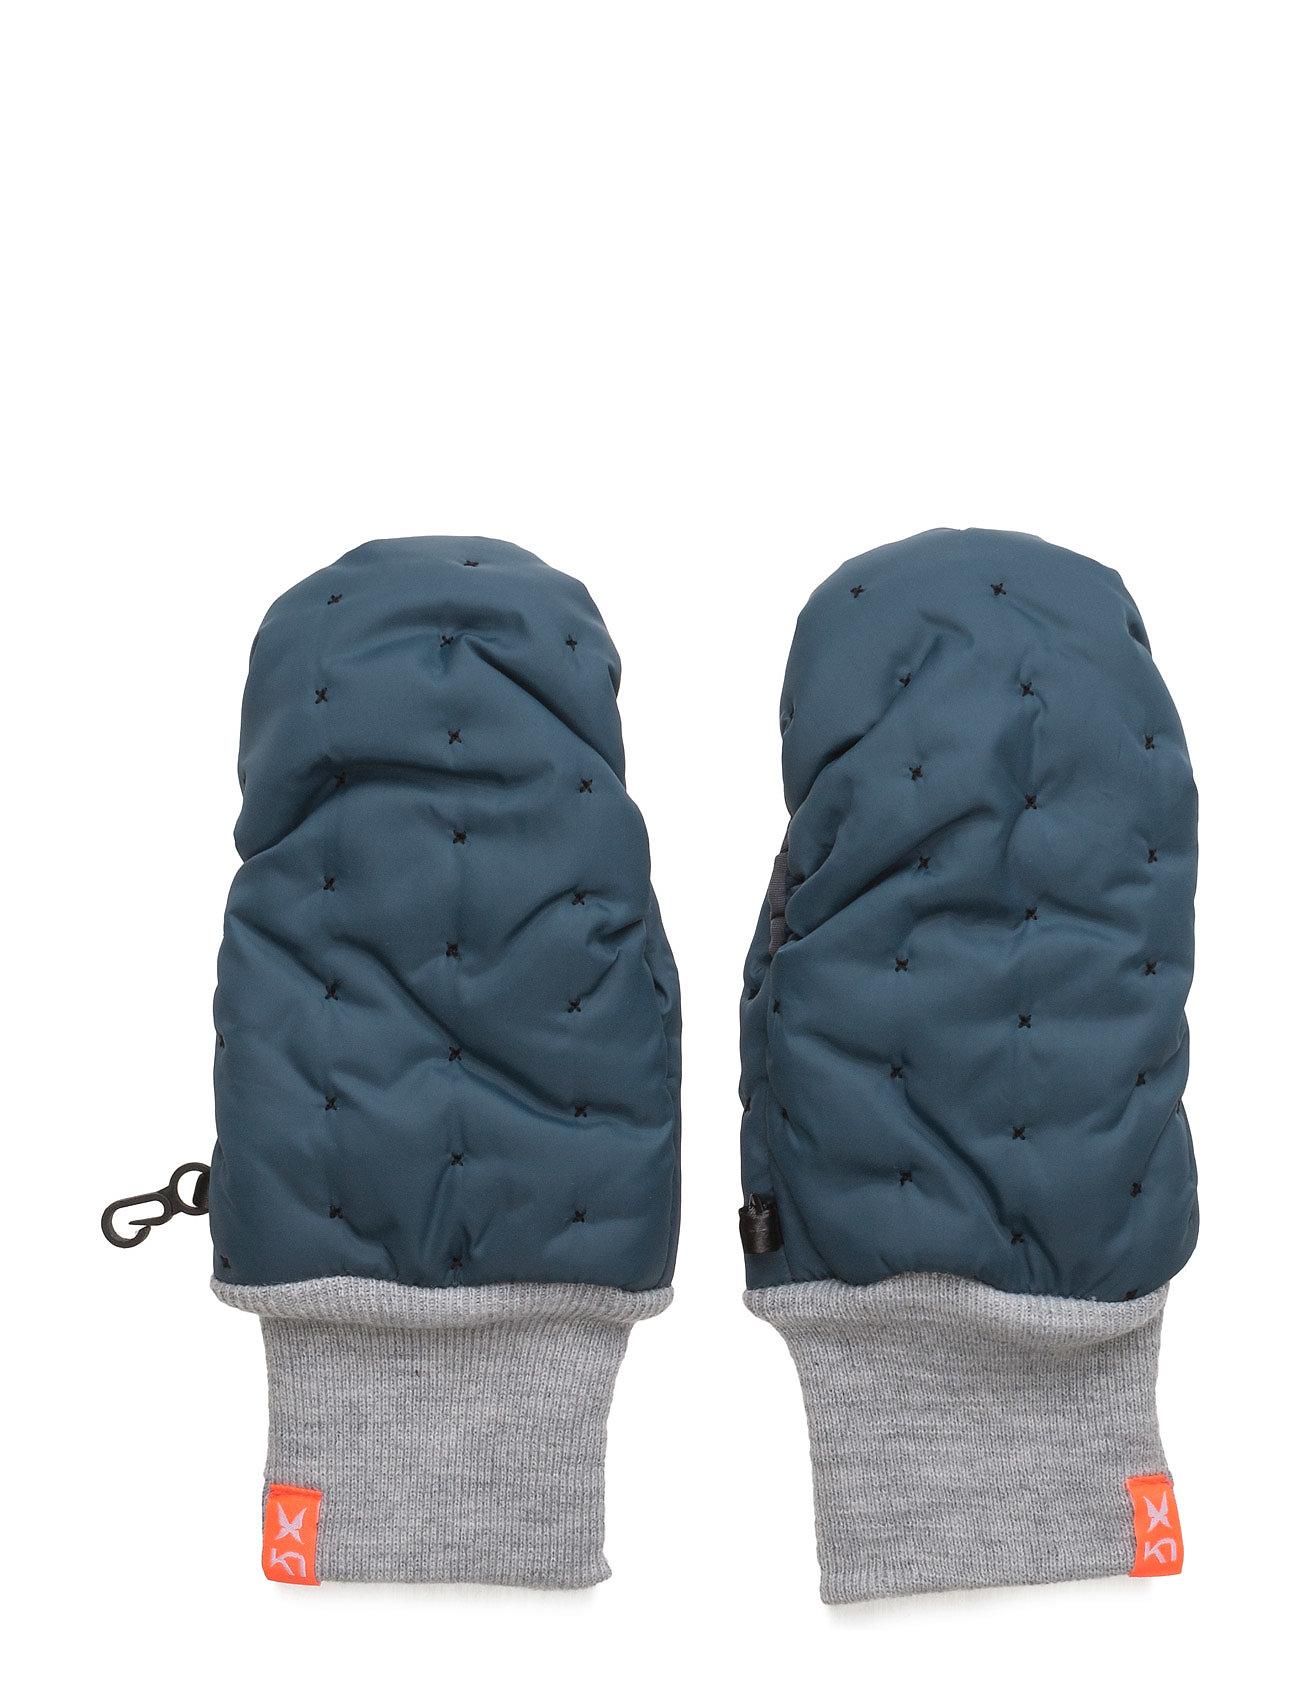 Flair Mitten Kari Traa Sports accessories til Kvinder i Navy blå